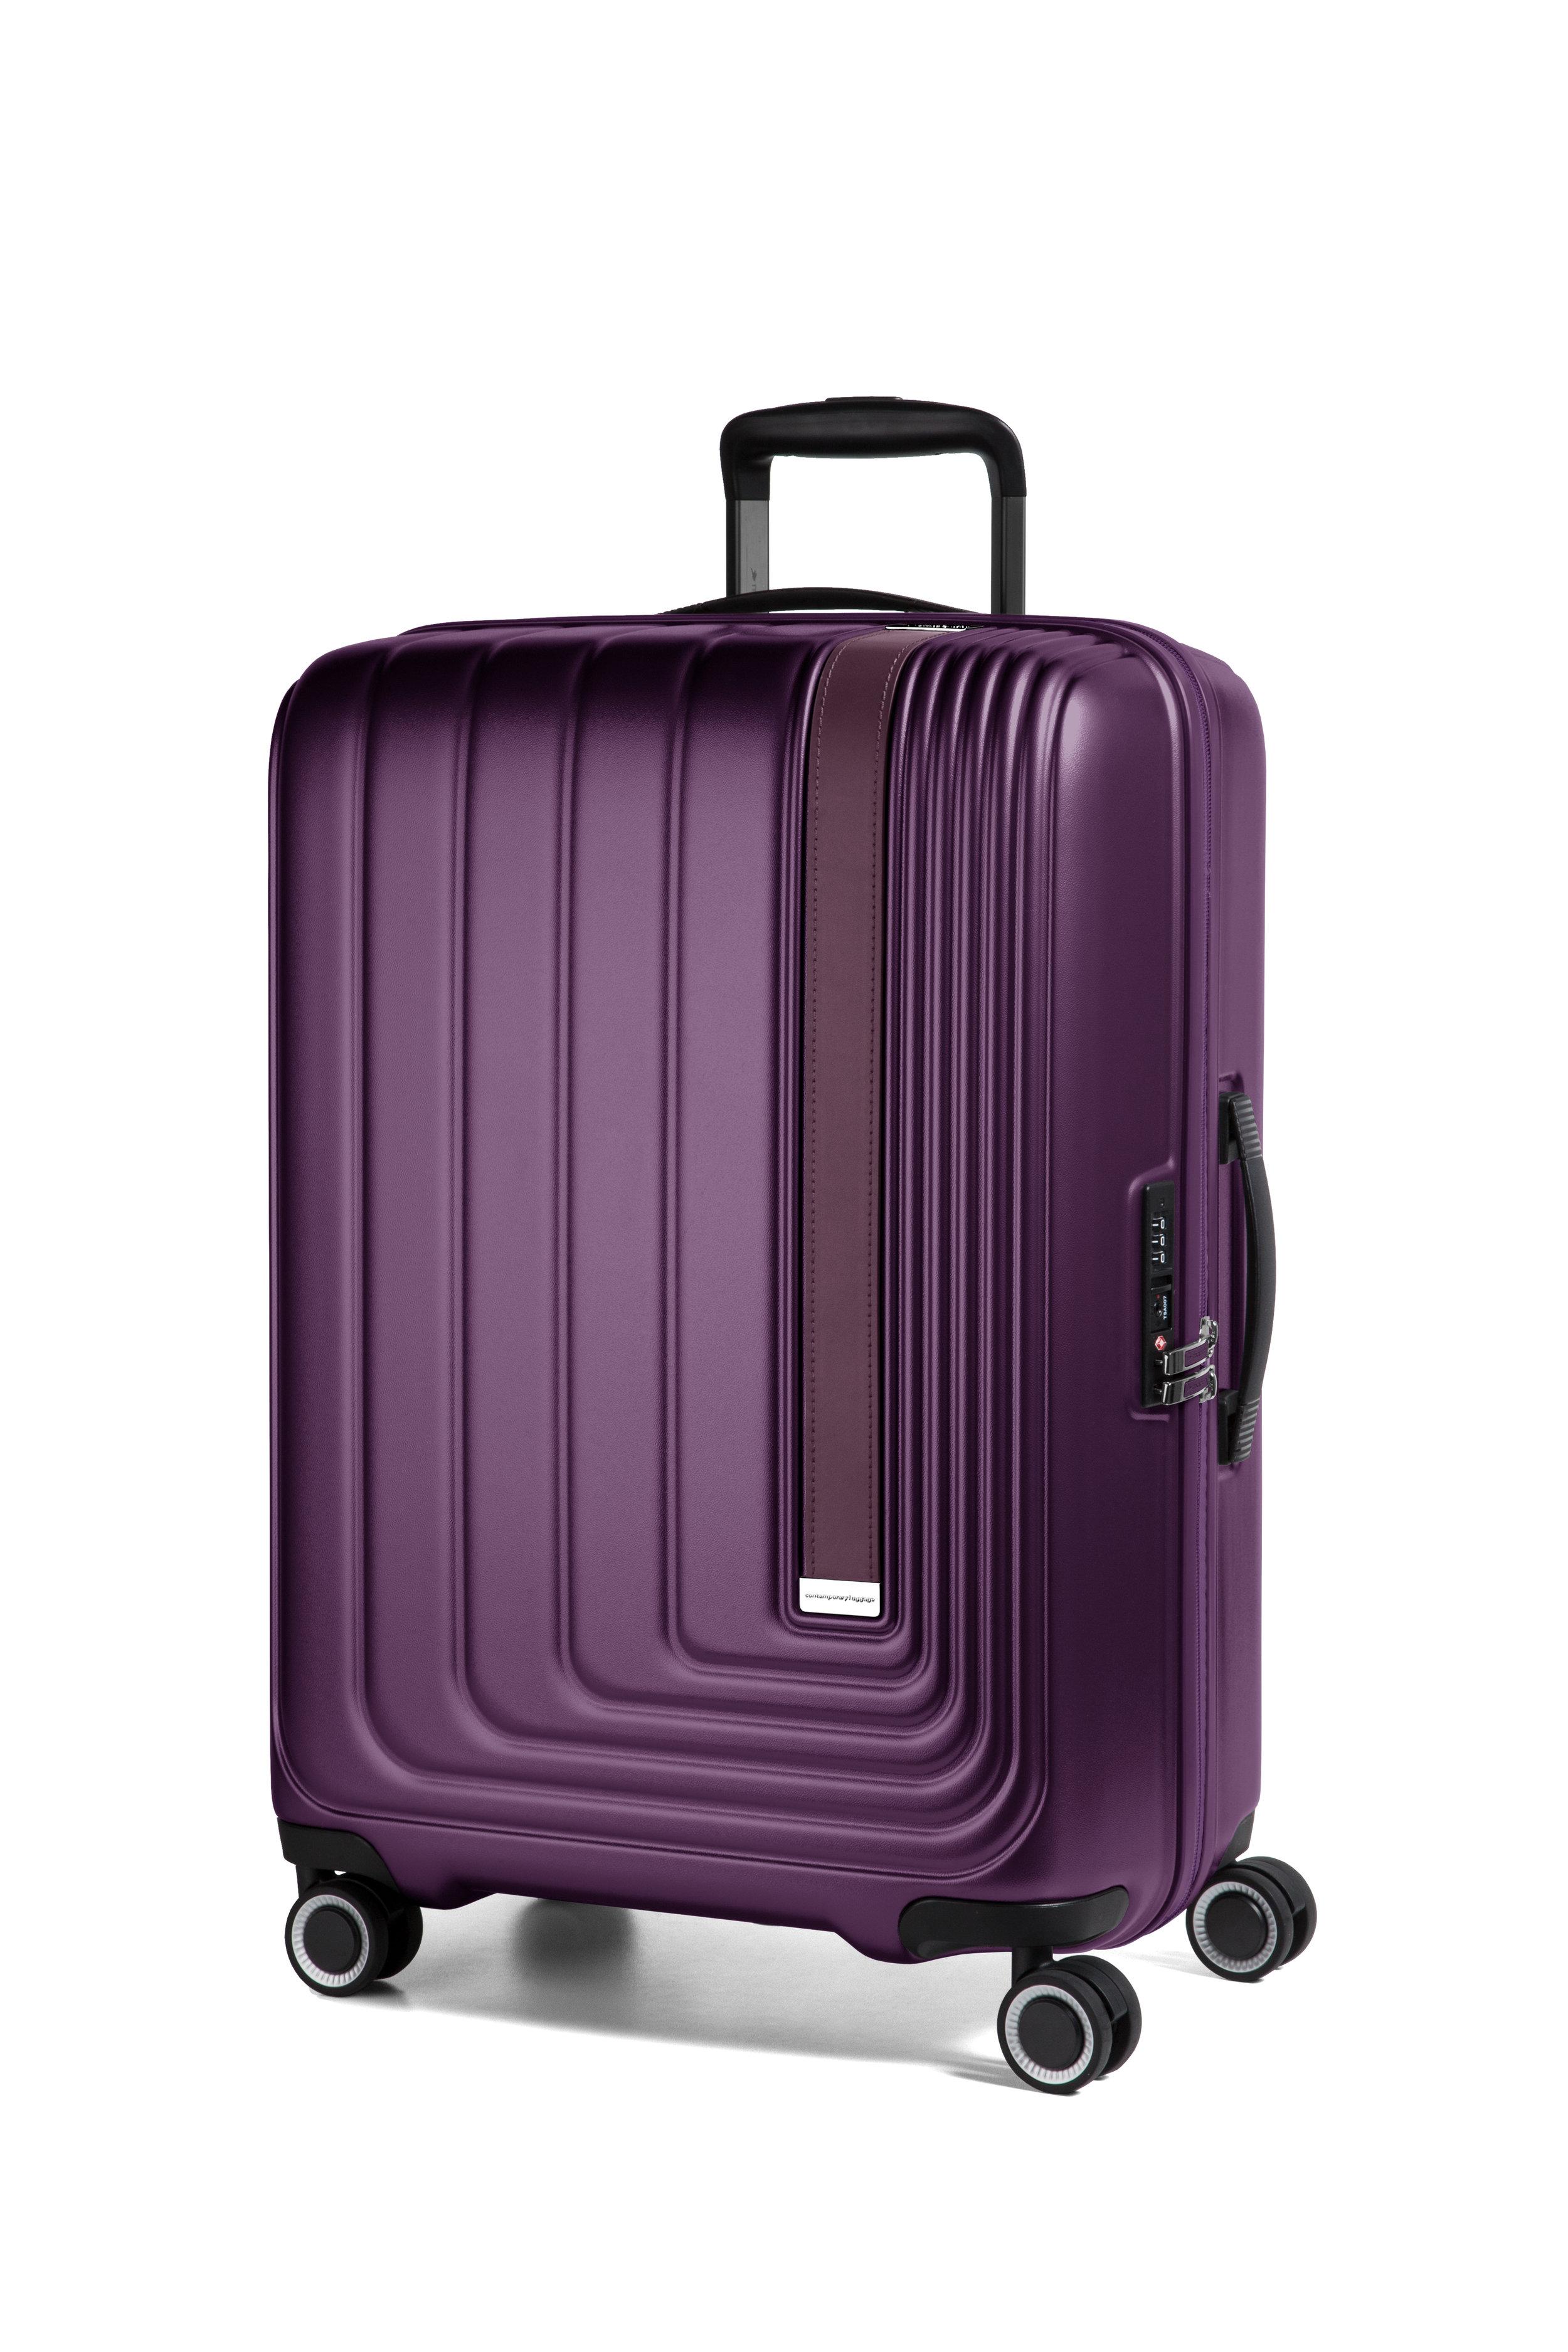 BEAU MONDE purple.jpg